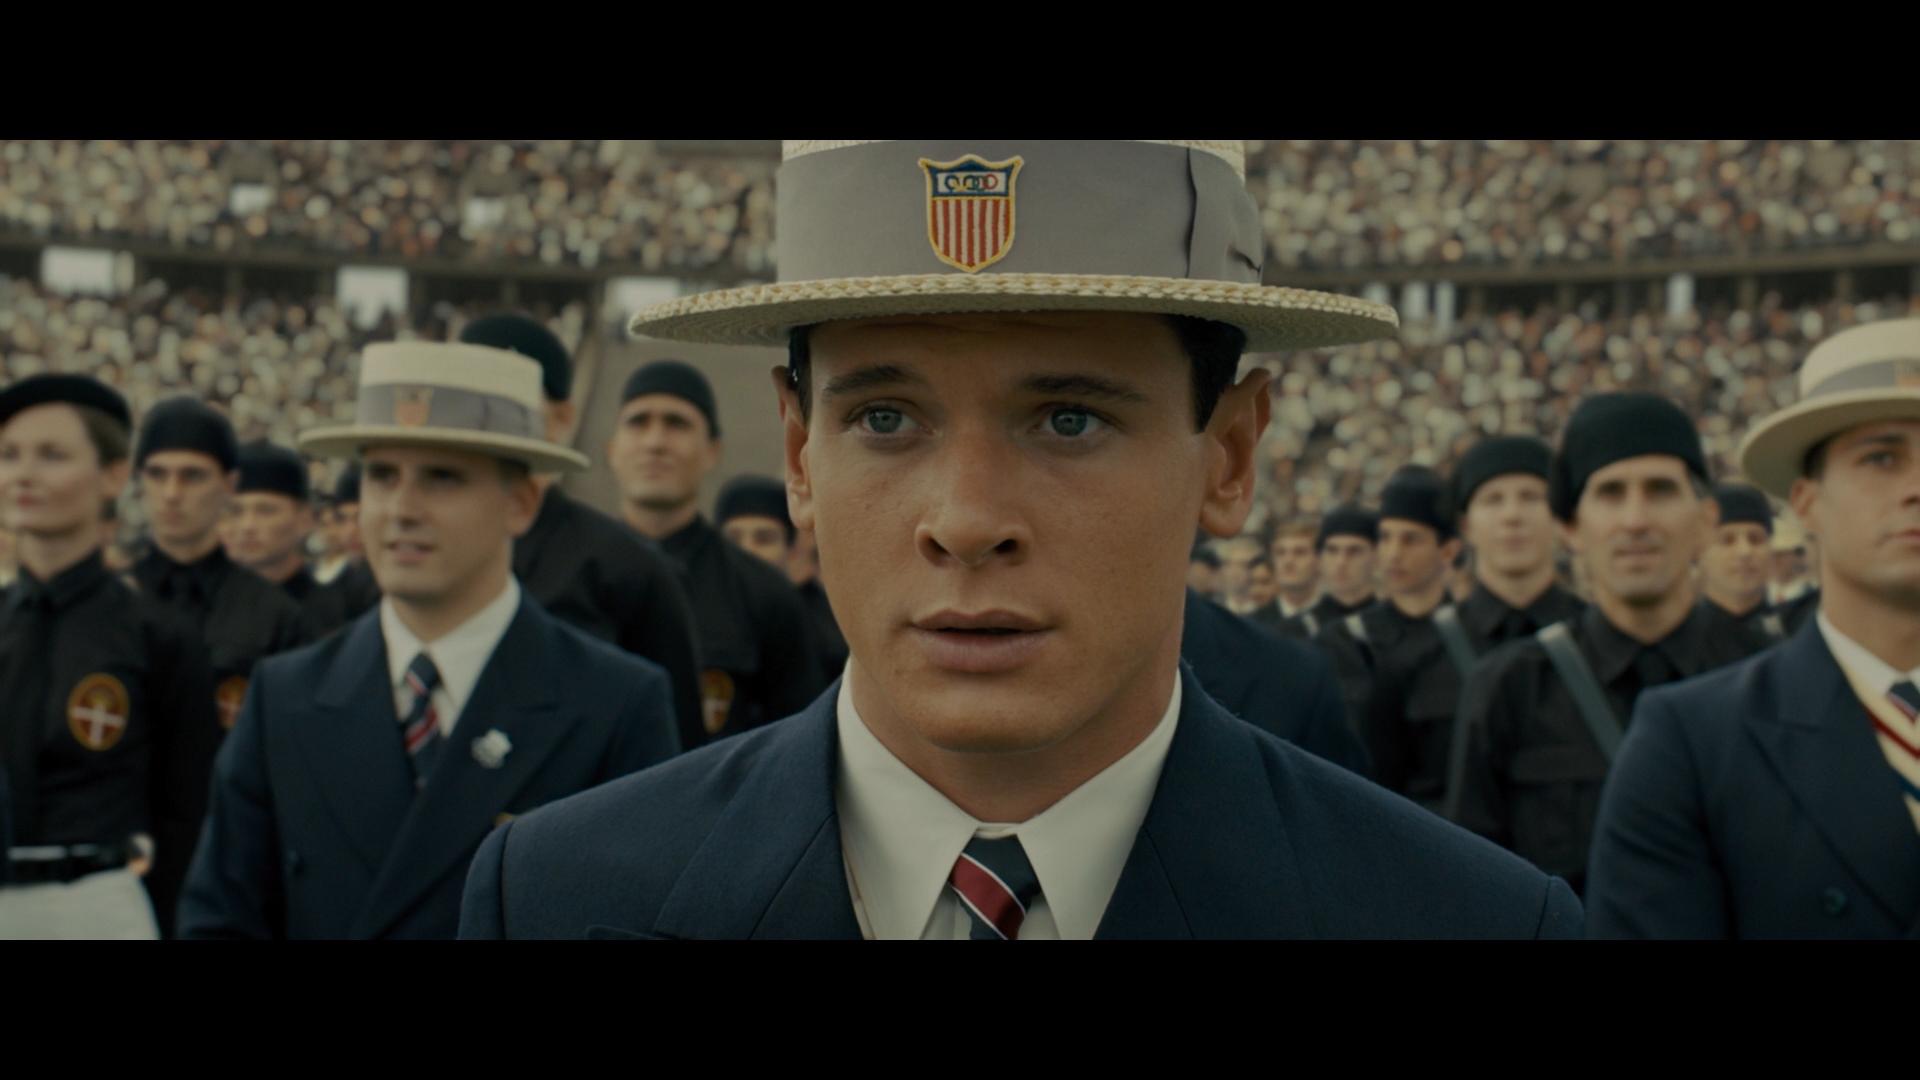 https://i2.wp.com/www.dvdbeaver.com/film5/blu-ray_reviews_66/unbroken_blu-ray_/large/large_unbroken_04_blu-ray_.jpg